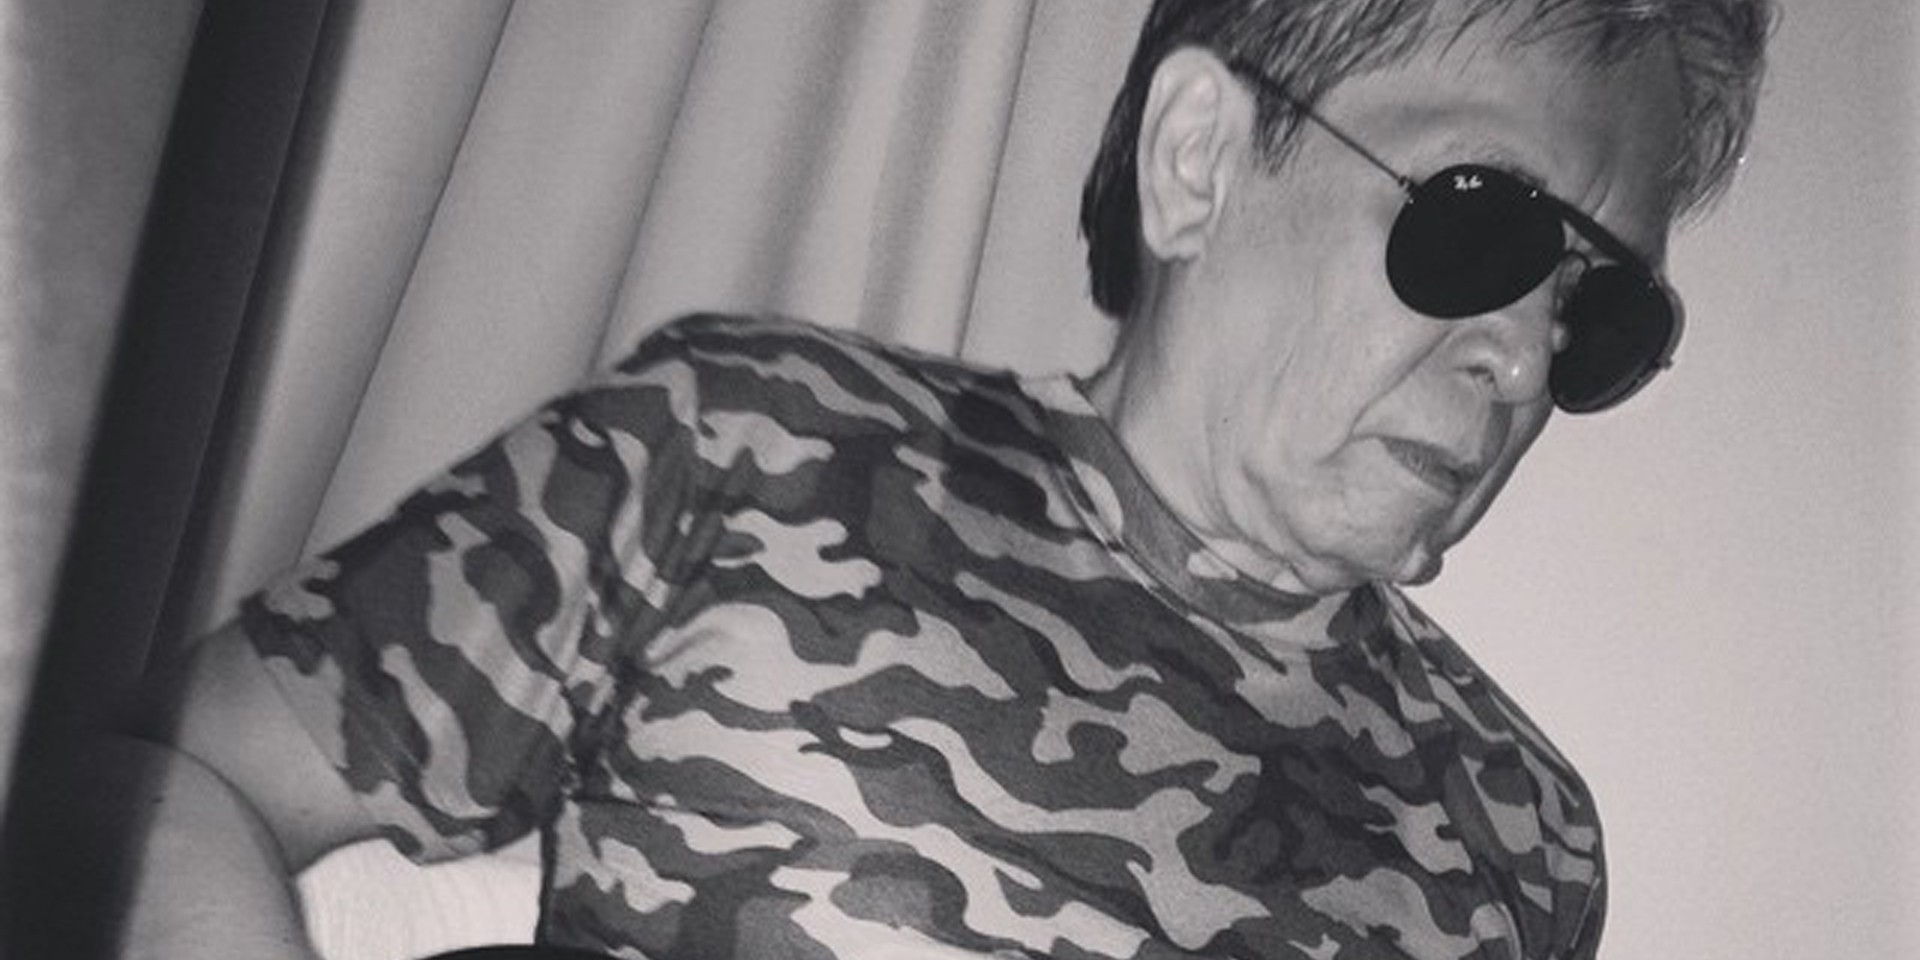 The Filipino music community pays tribute to late guitarist Wally Gonzalez